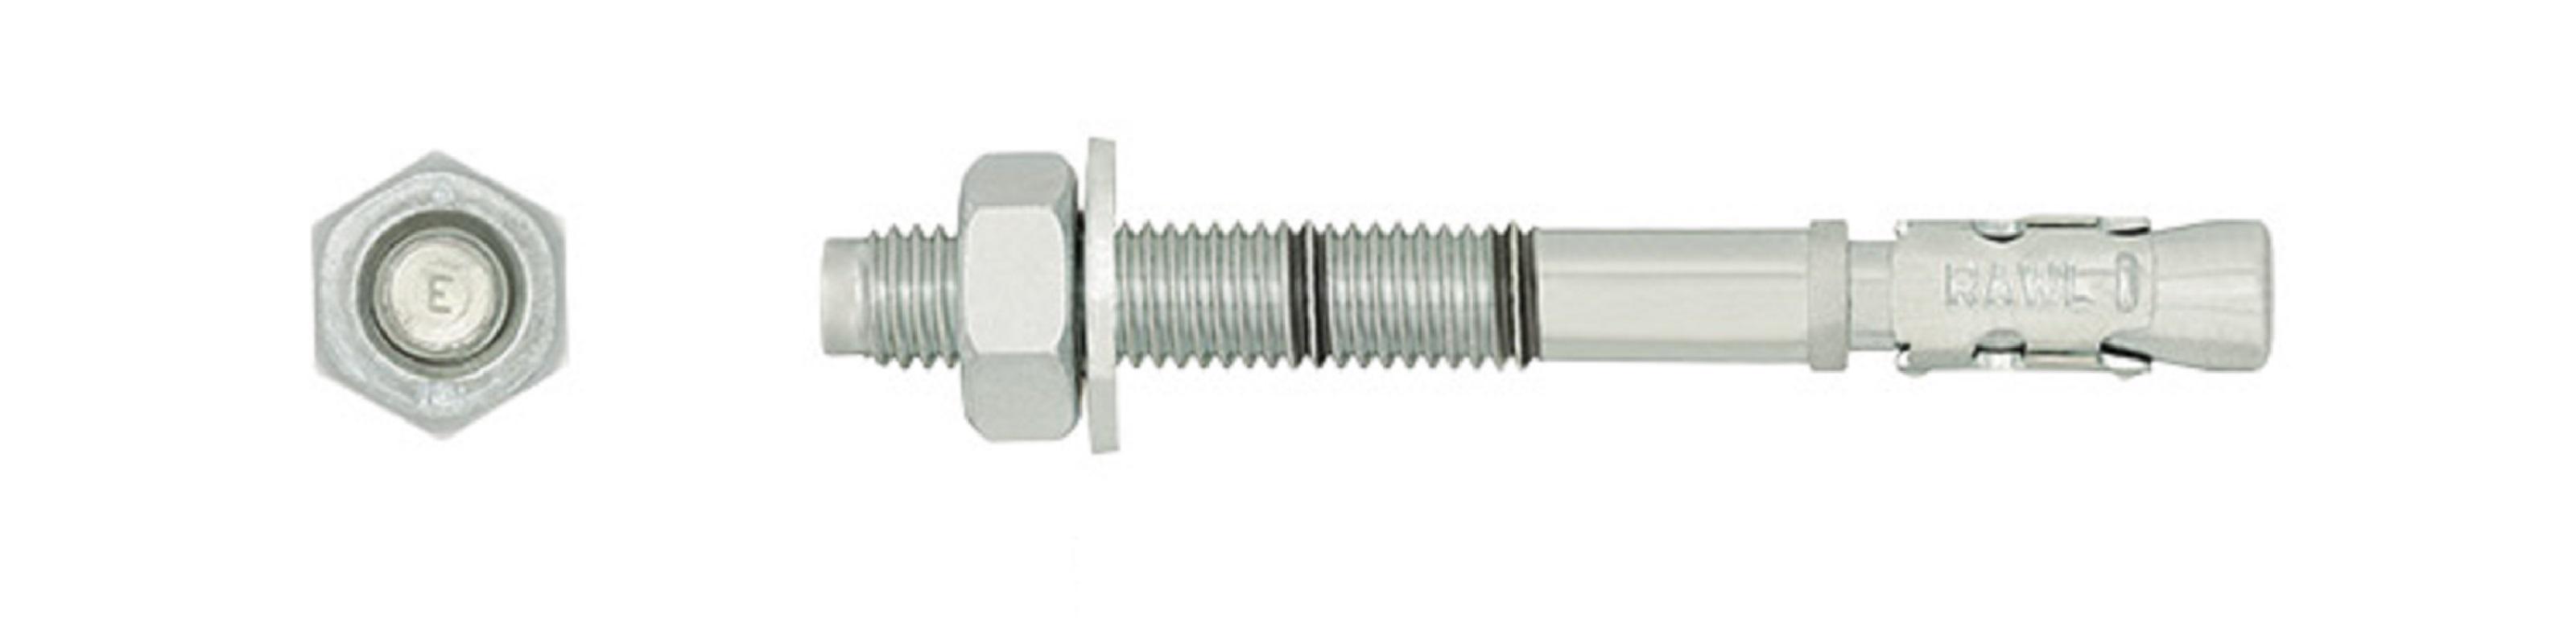 Rawl Trade Throughbolt M8X140 BZP (4pcs)